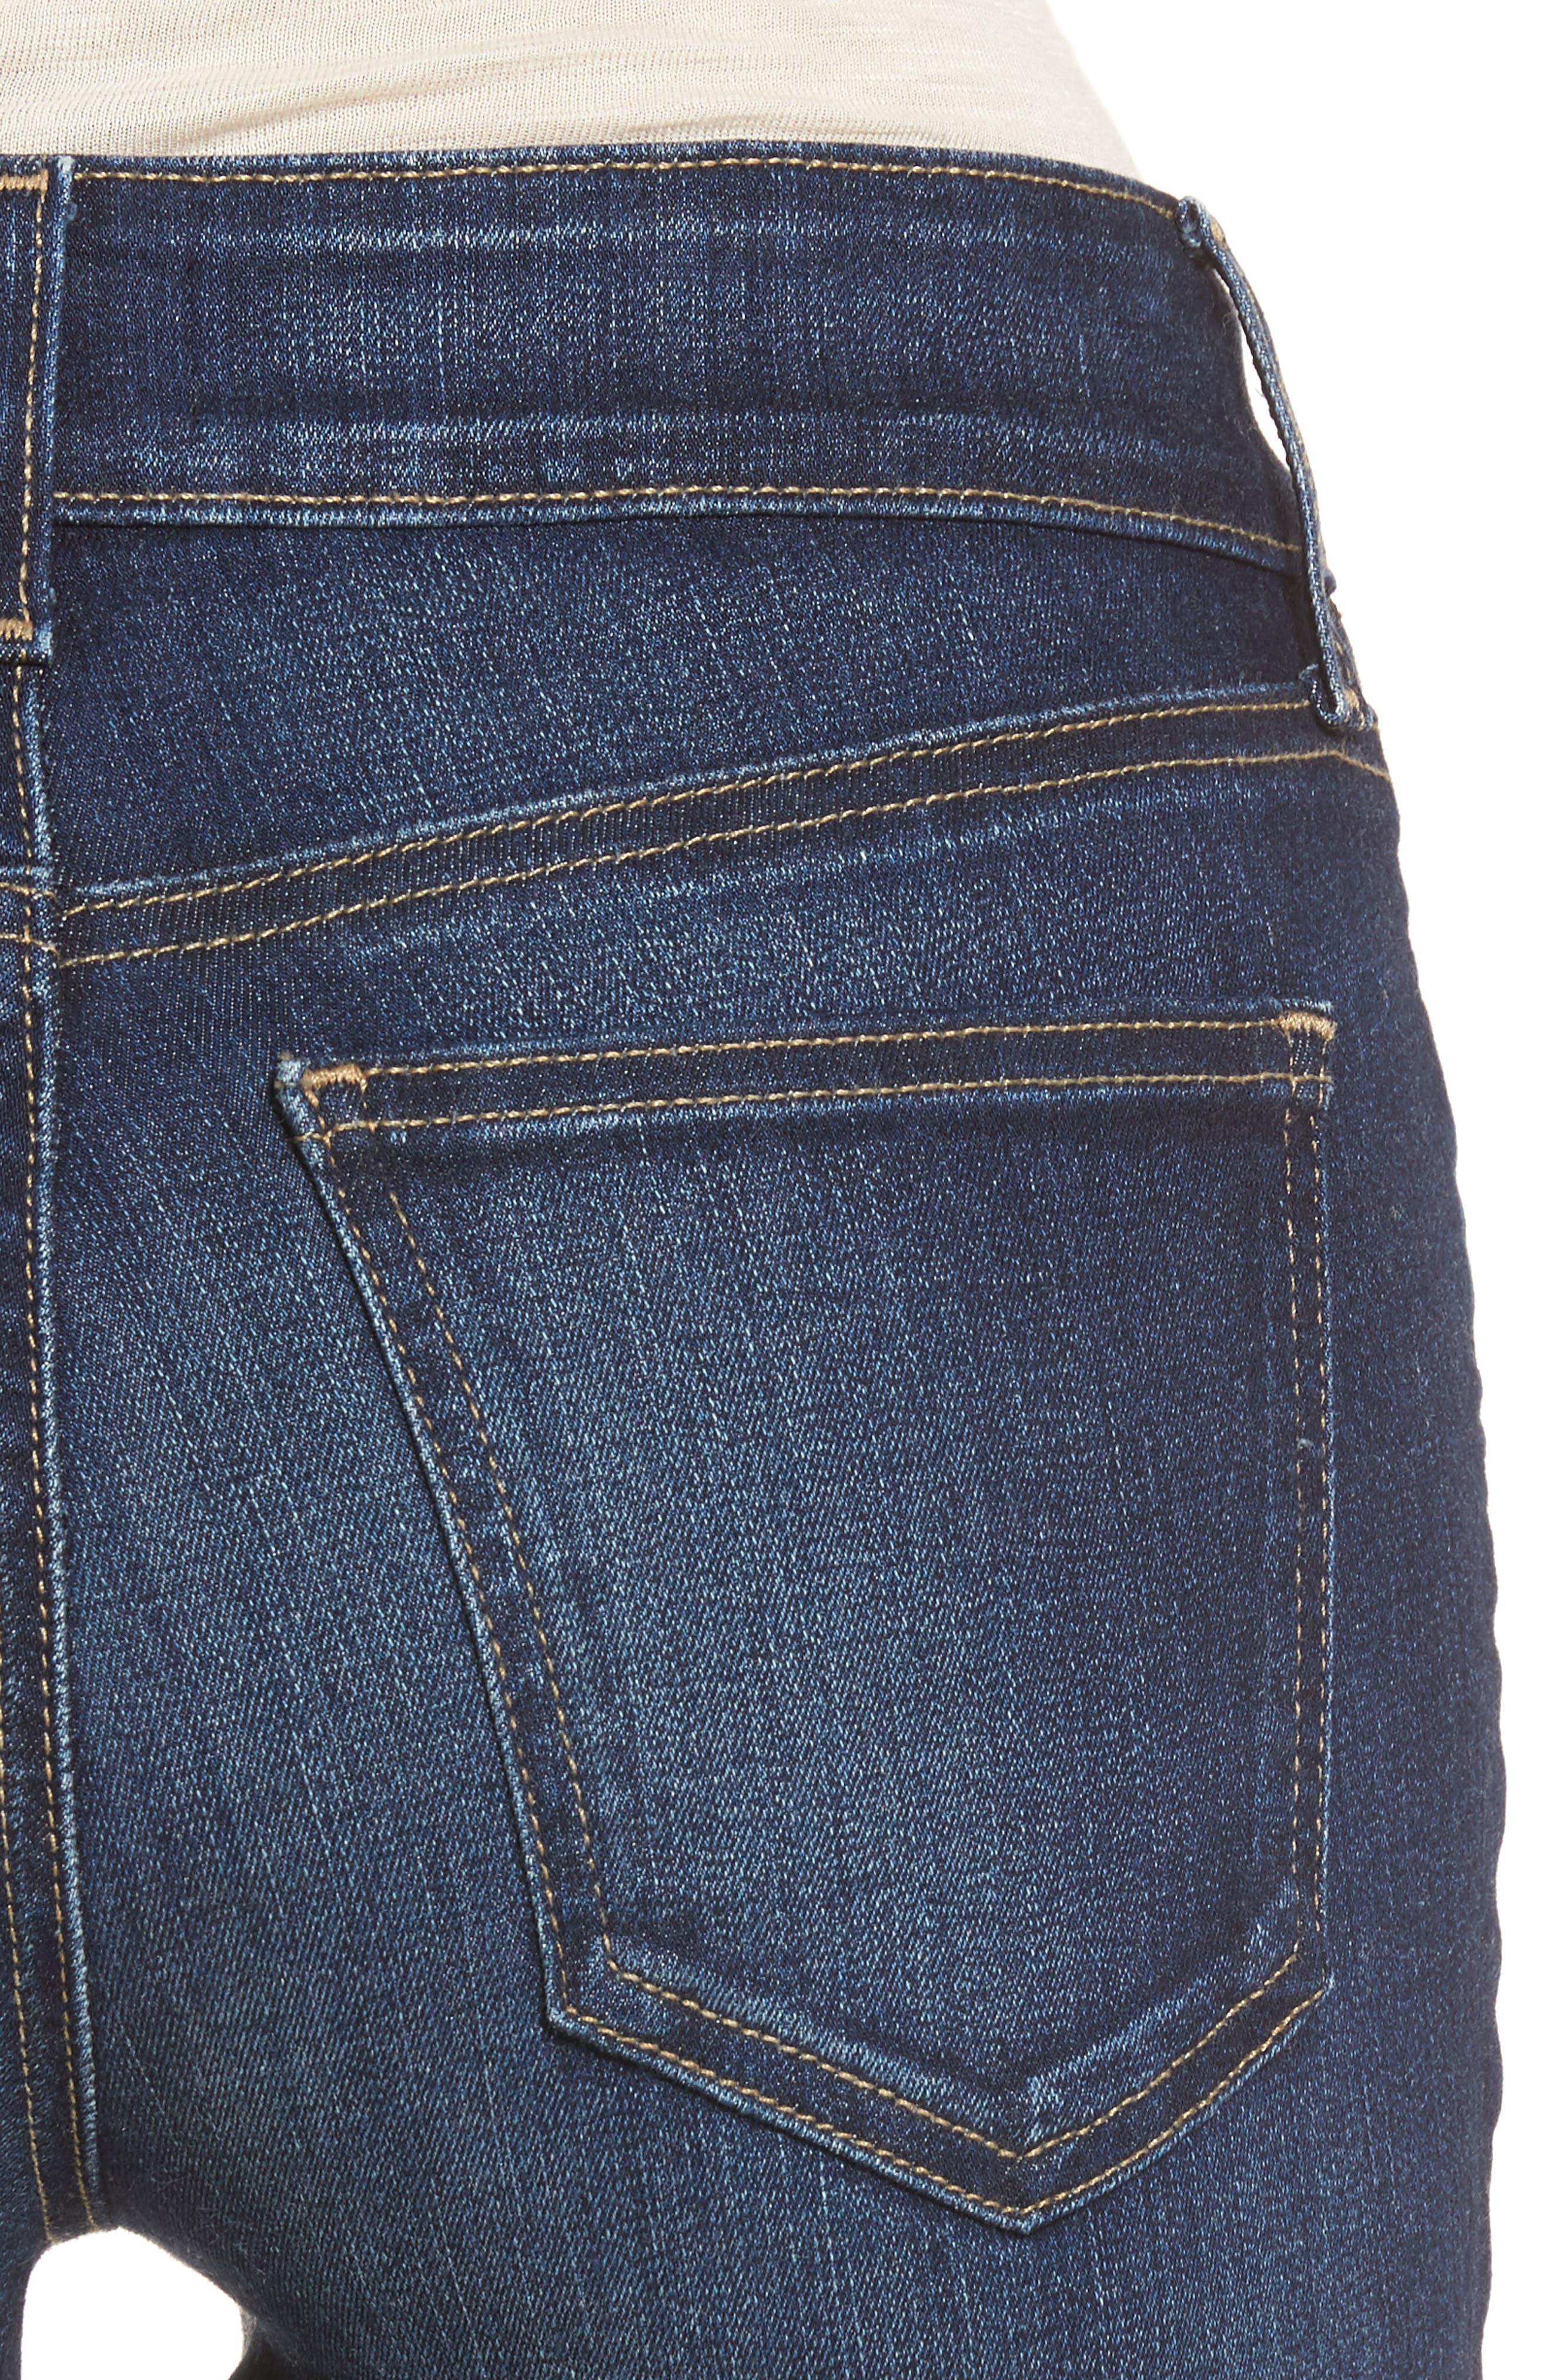 Alina Release Hem Stretch Ankle Jeans,                             Alternate thumbnail 5, color,                             Bezel